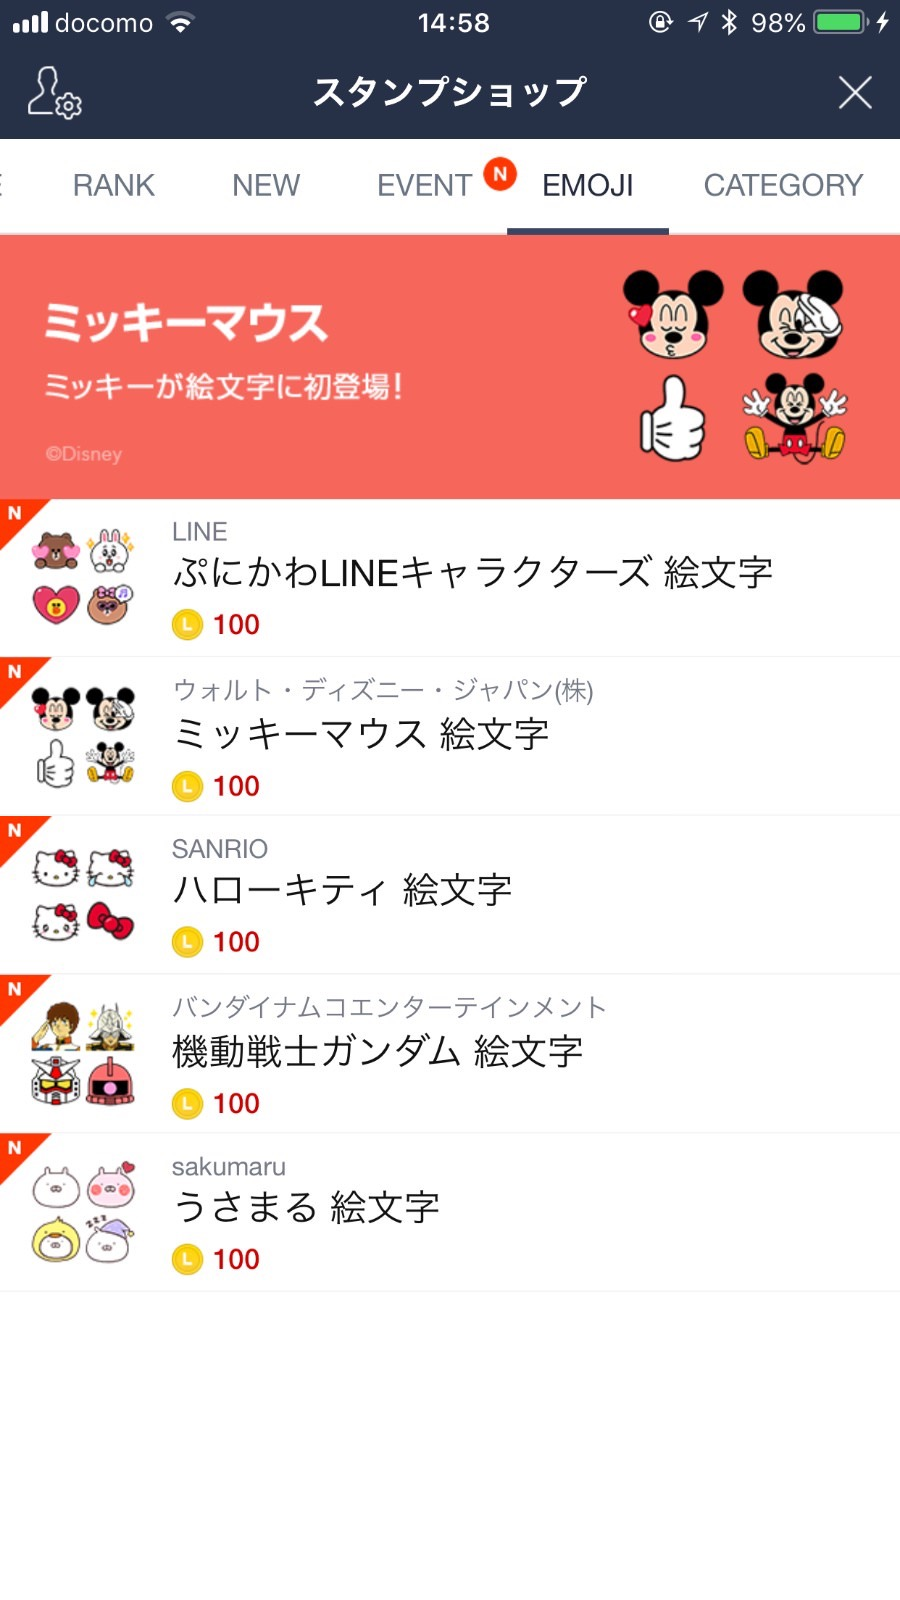 【LINE】人気キャラクターが絵文字になった「LINE絵文字」発売開始